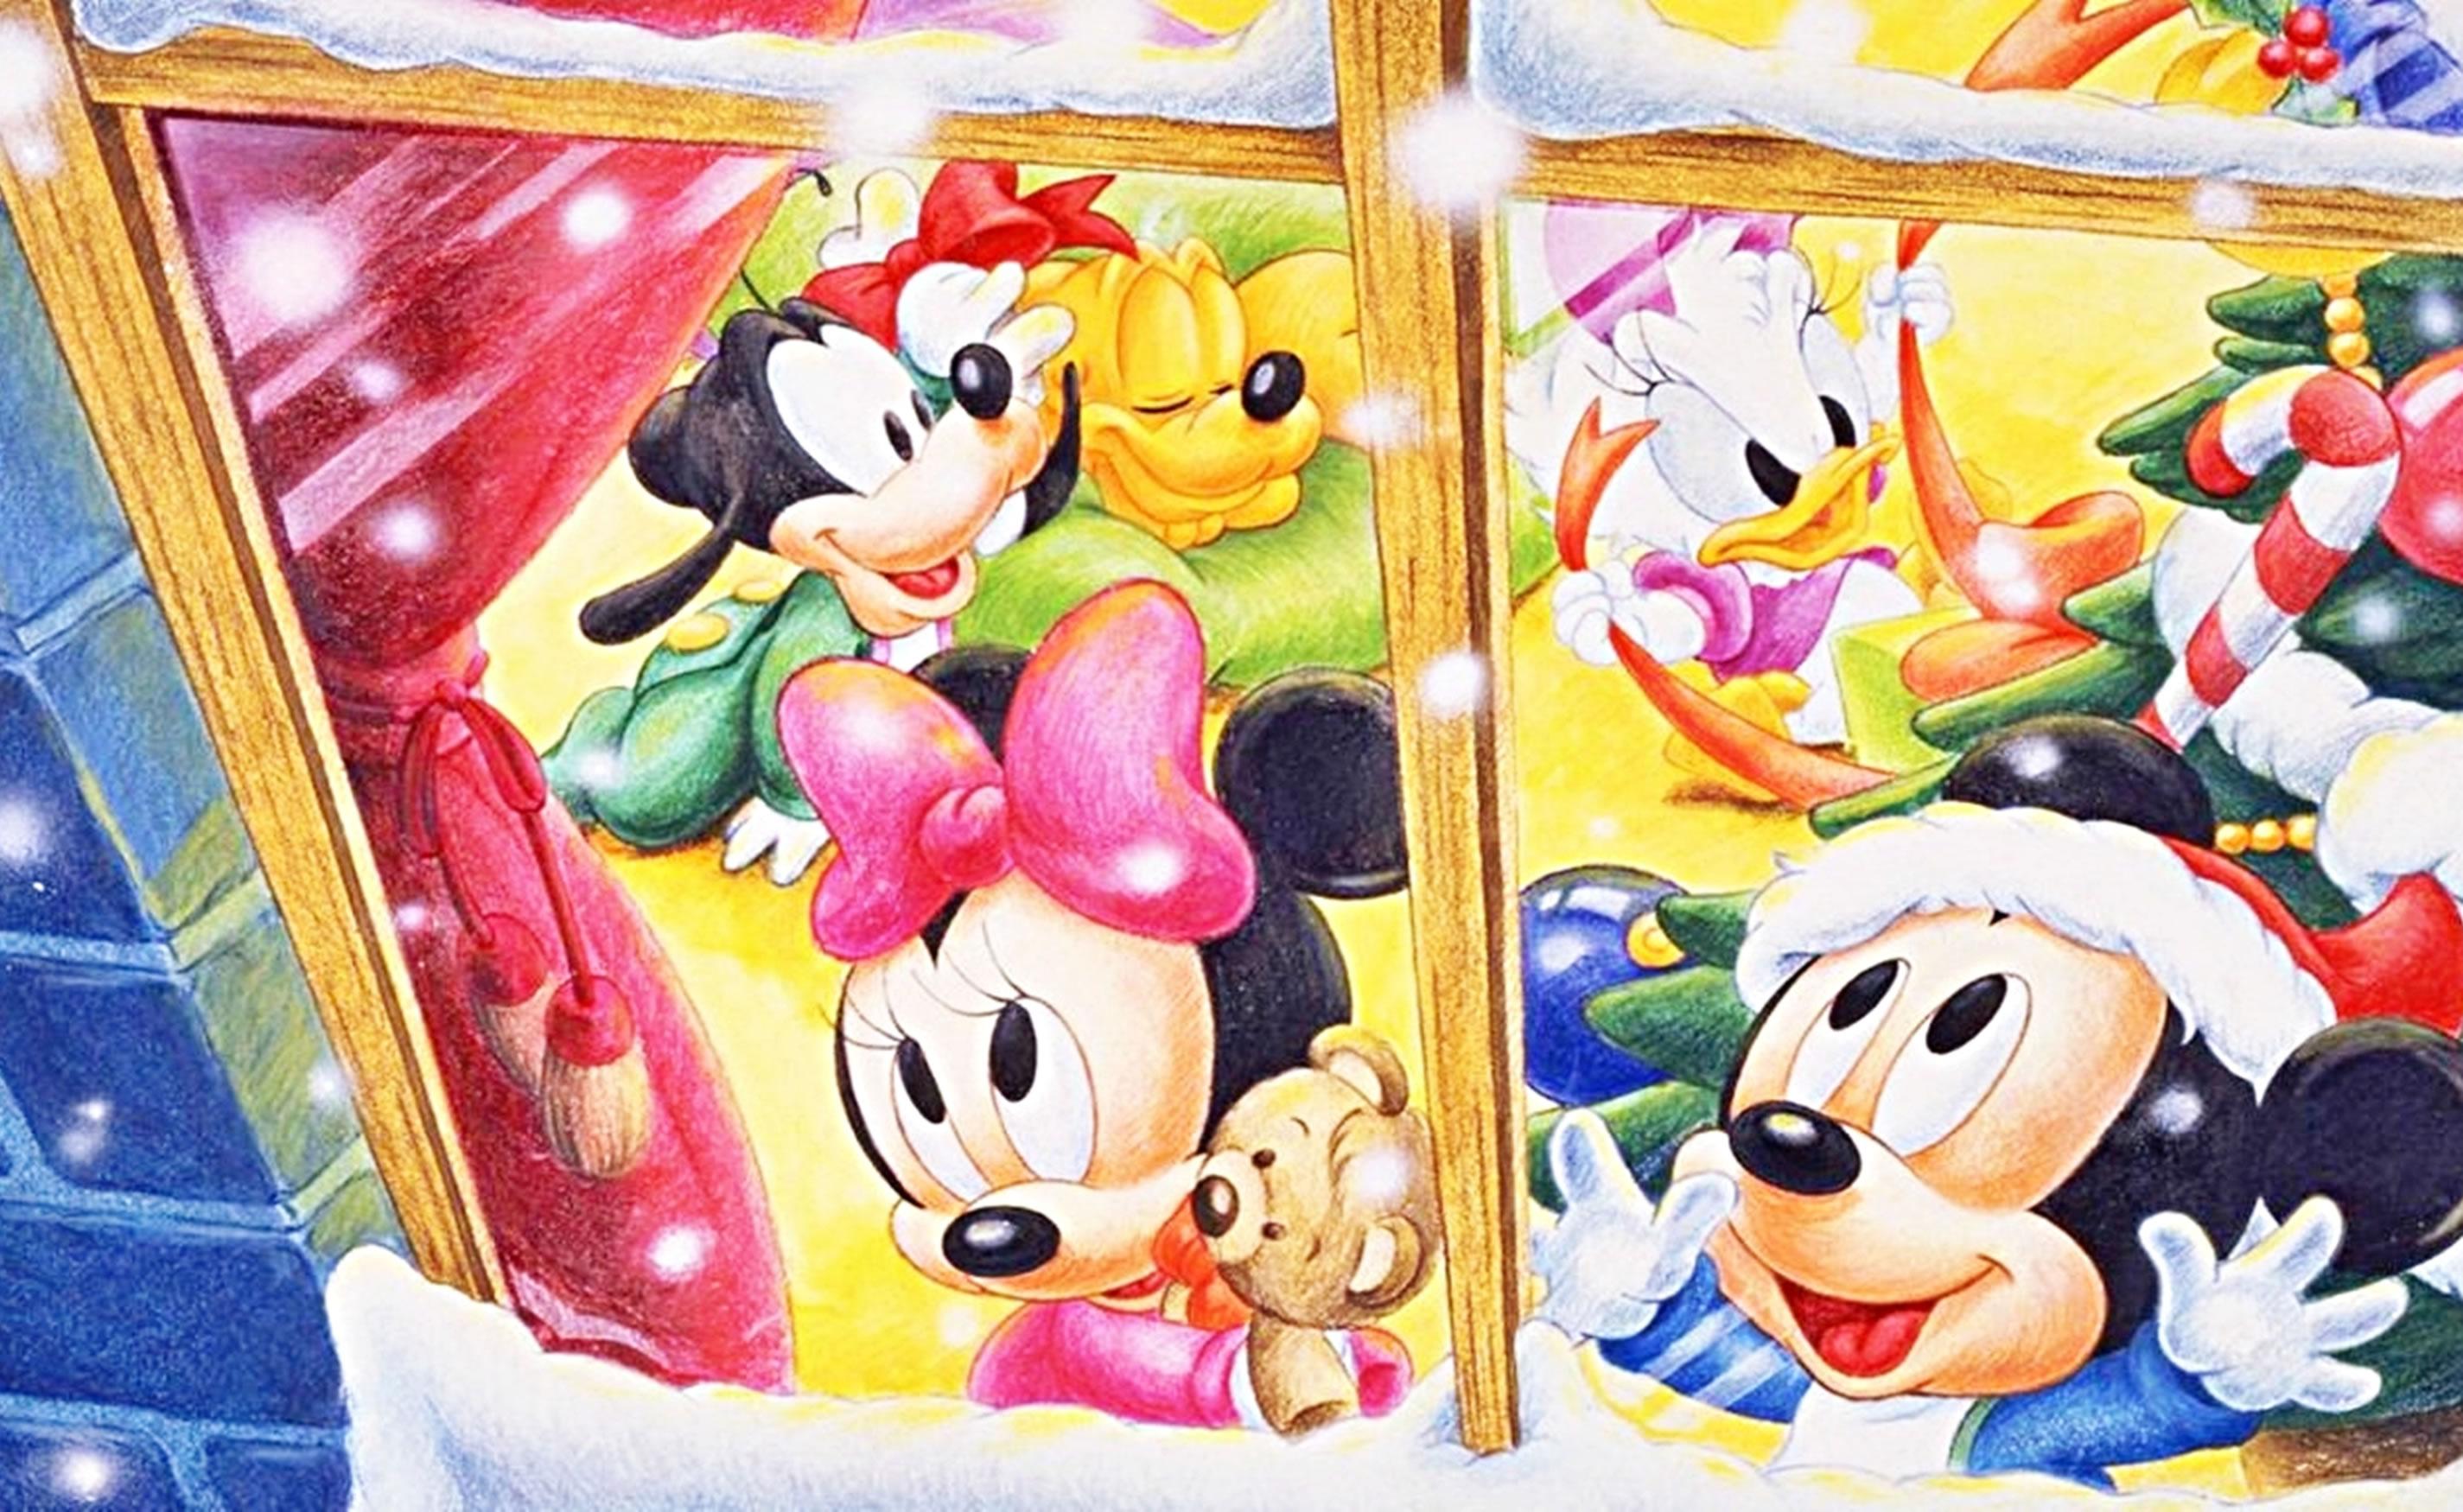 download wallpaper: Mickey Mouse viert kerst wallpaper